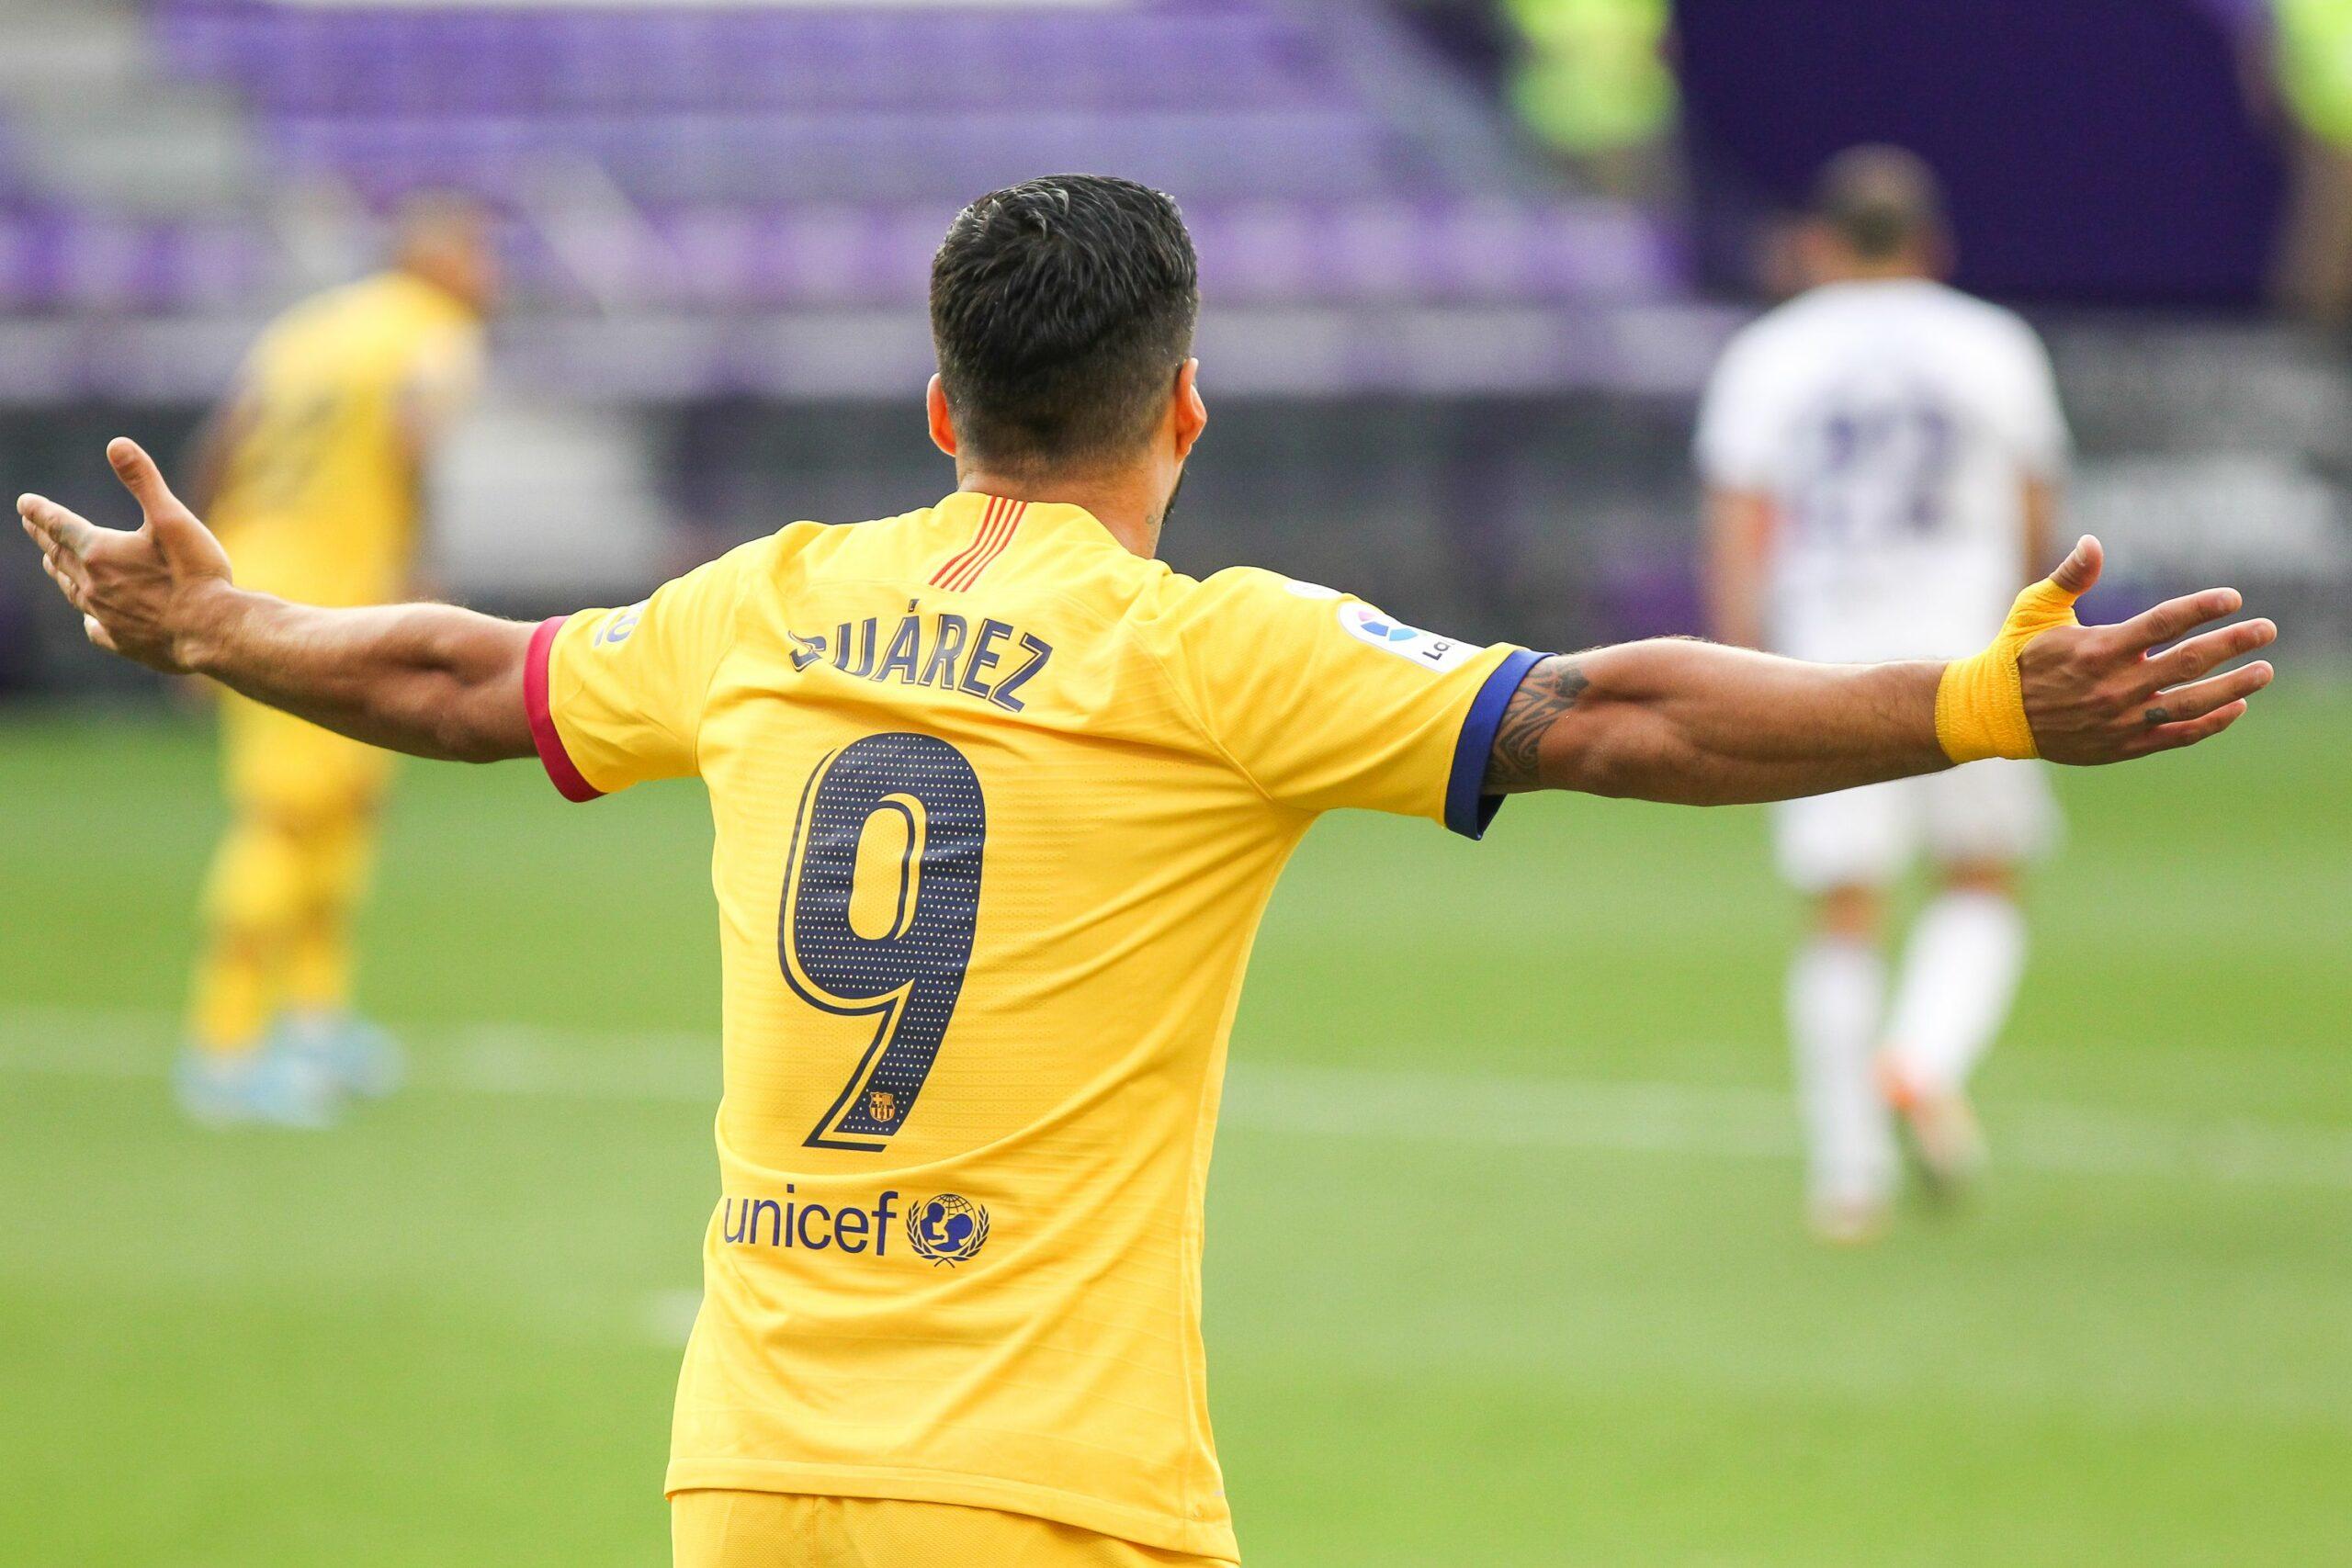 Luis Suárez, davanter del Barça | Europa Press